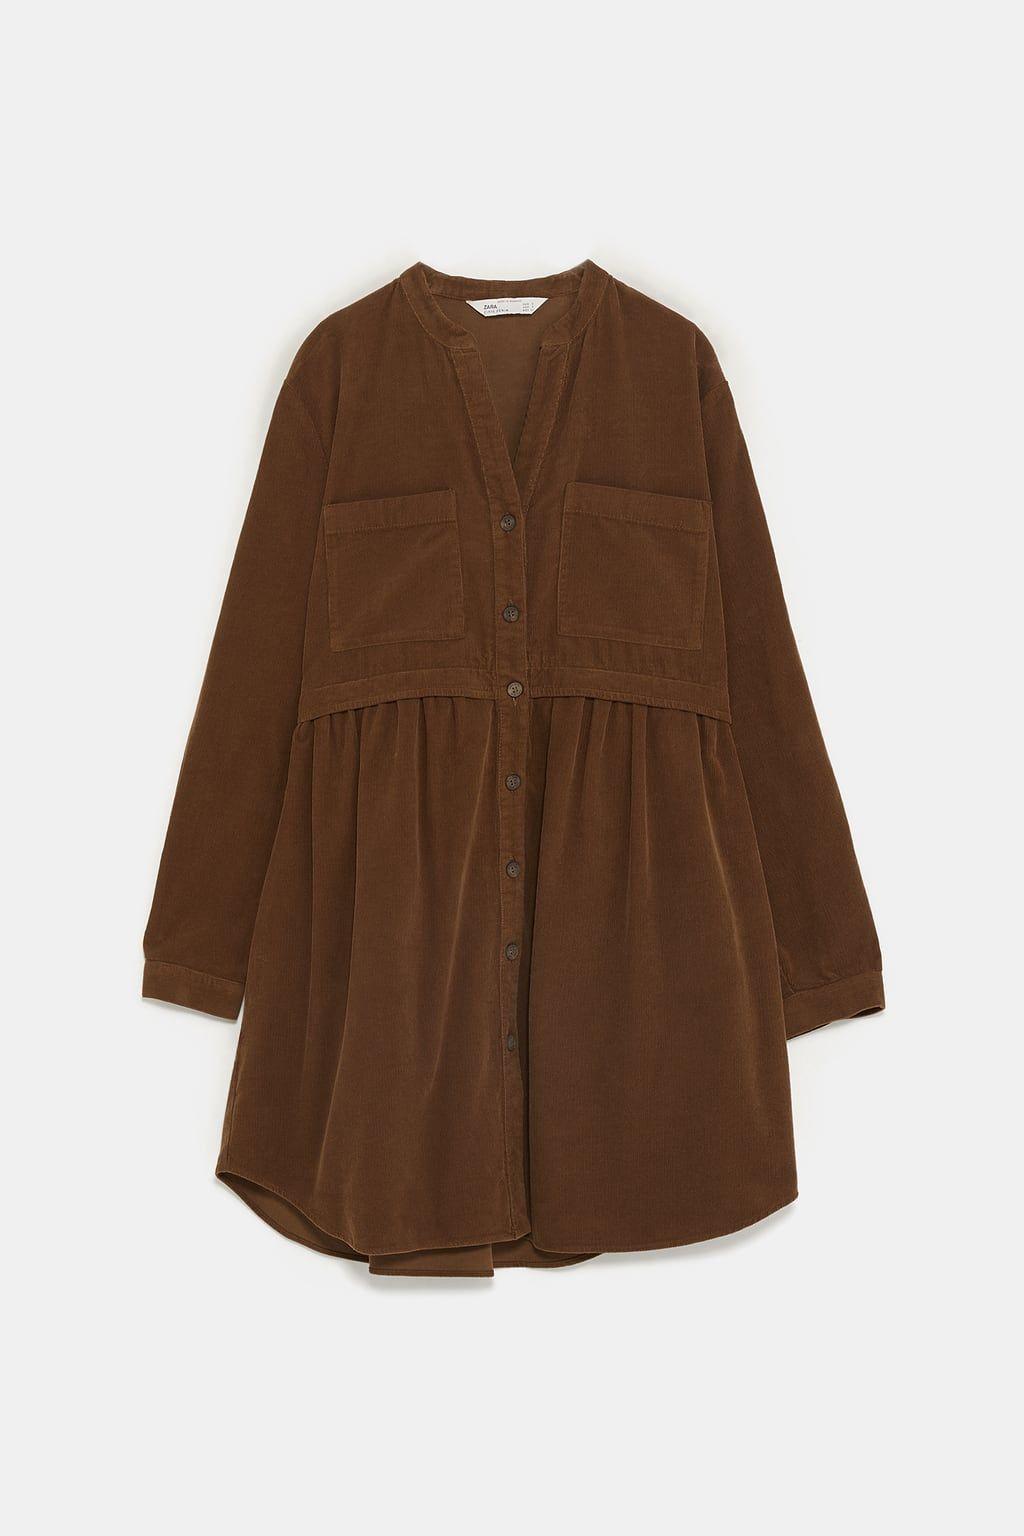 Izobrazhenie 8 Iz Plate Iz Velveta Ot Zara Corduroy Dress Muslimah Fashion Outfits Fashion Design Clothes [ 1536 x 1024 Pixel ]